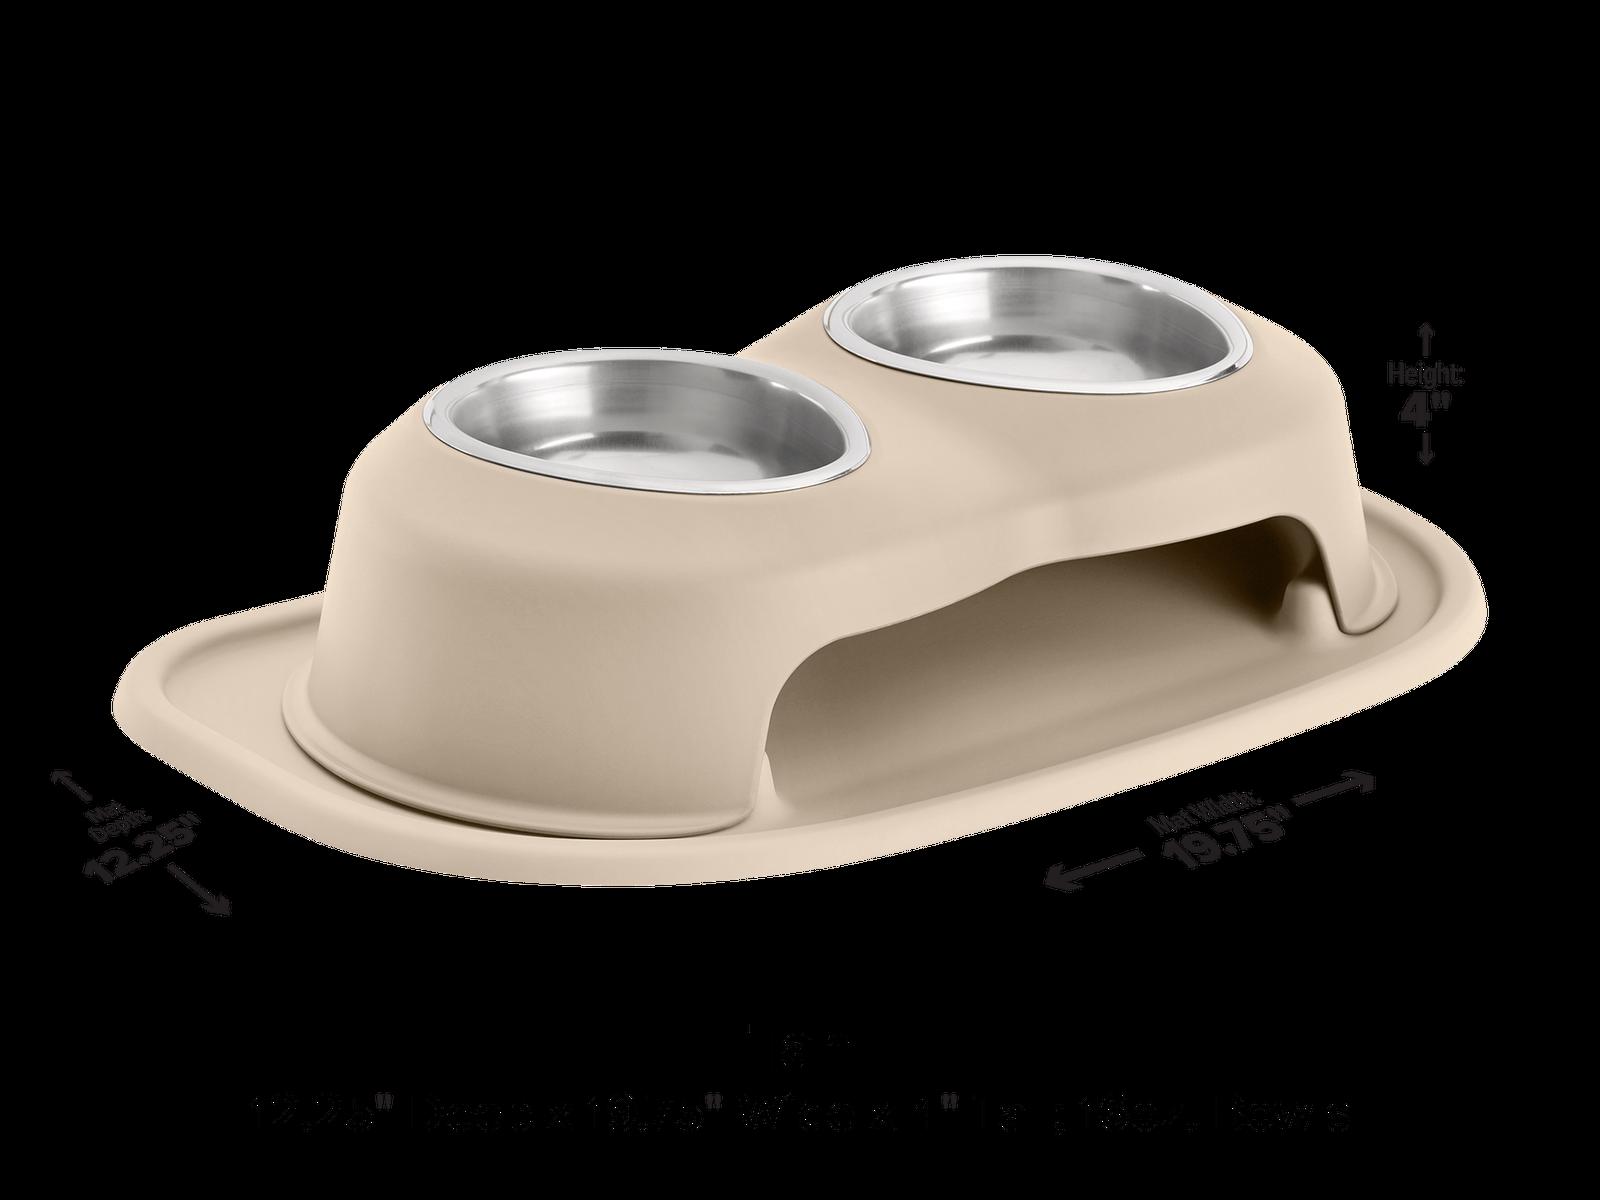 PetComfort PetComfort PetComfort Double High Feeding System w  Standard Mat - Dog Cat Feeder - Tan 551824